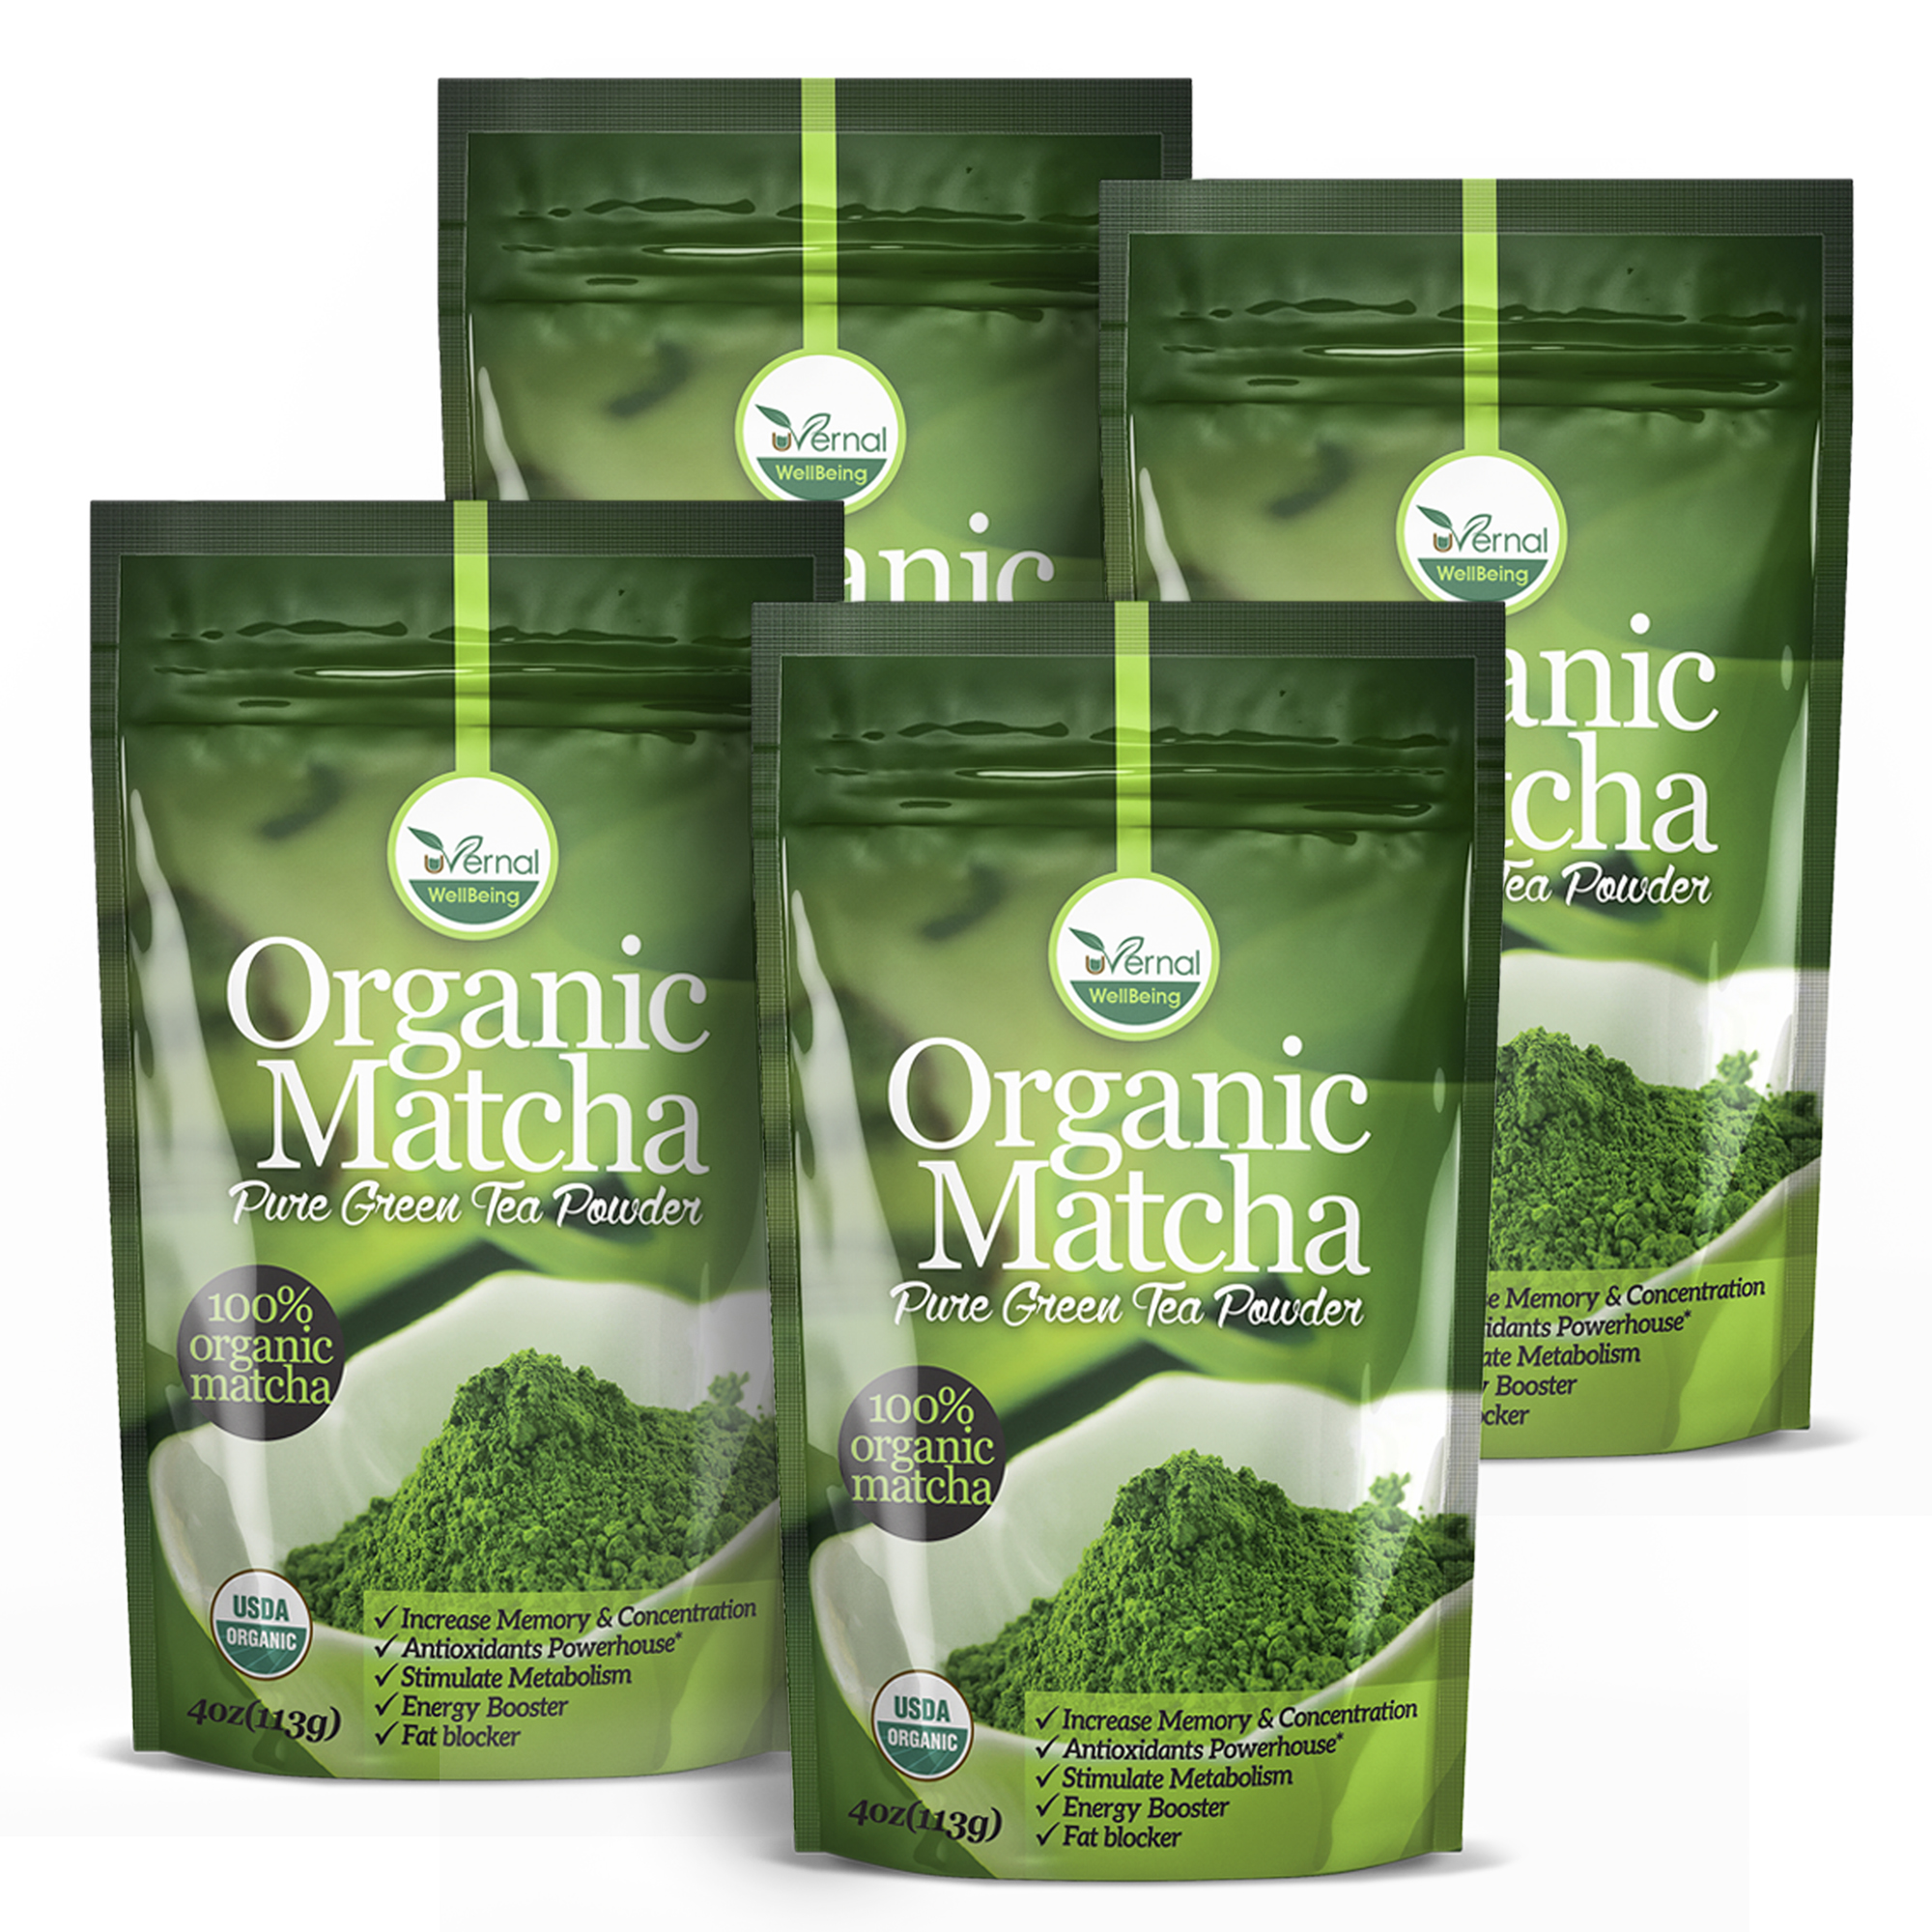 4 Pack Organic Matcha Green Tea Powder - 100% Pure Matcha (No Sugar Added - Unsweetened Pure Green Tea - No Coloring Added Like Others) 4oz